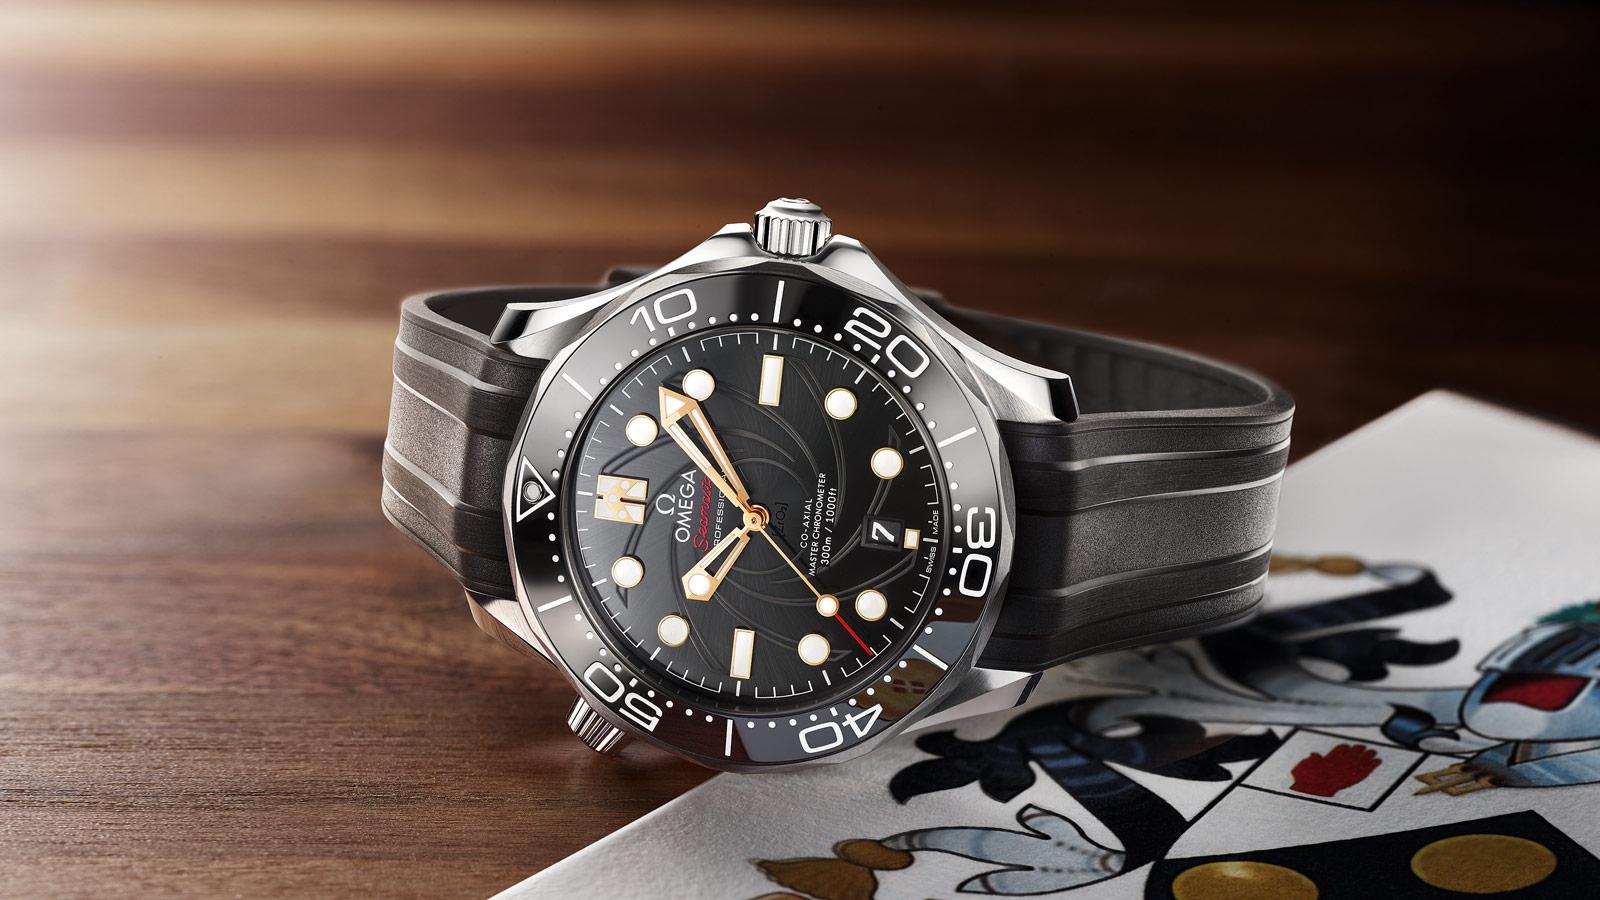 Seamaster 300米潜水表 300米潜水表 欧米茄至臻天文台表42毫米 腕表 - 210.22.42.20.01.004